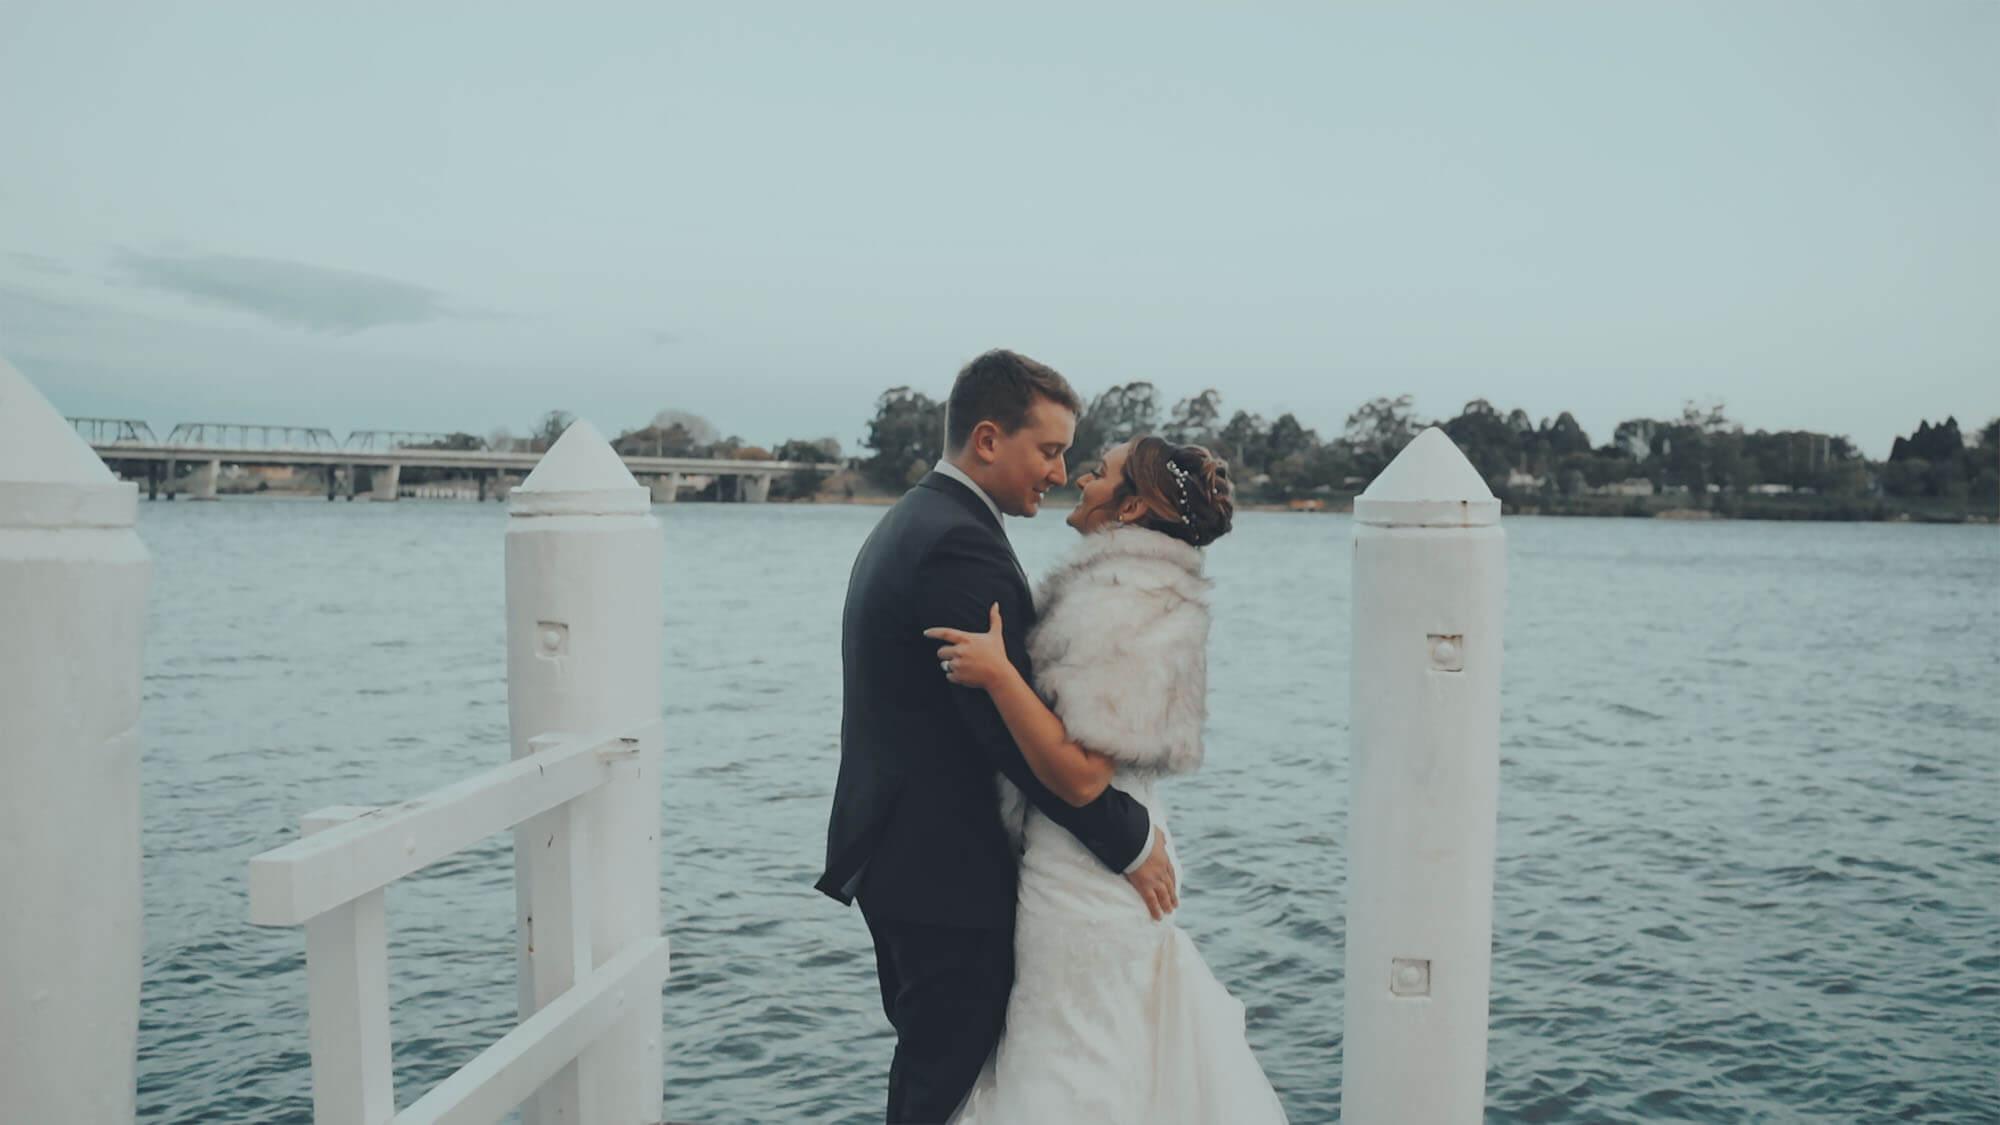 Best wedding videographer films Shoalhaven River Wedding